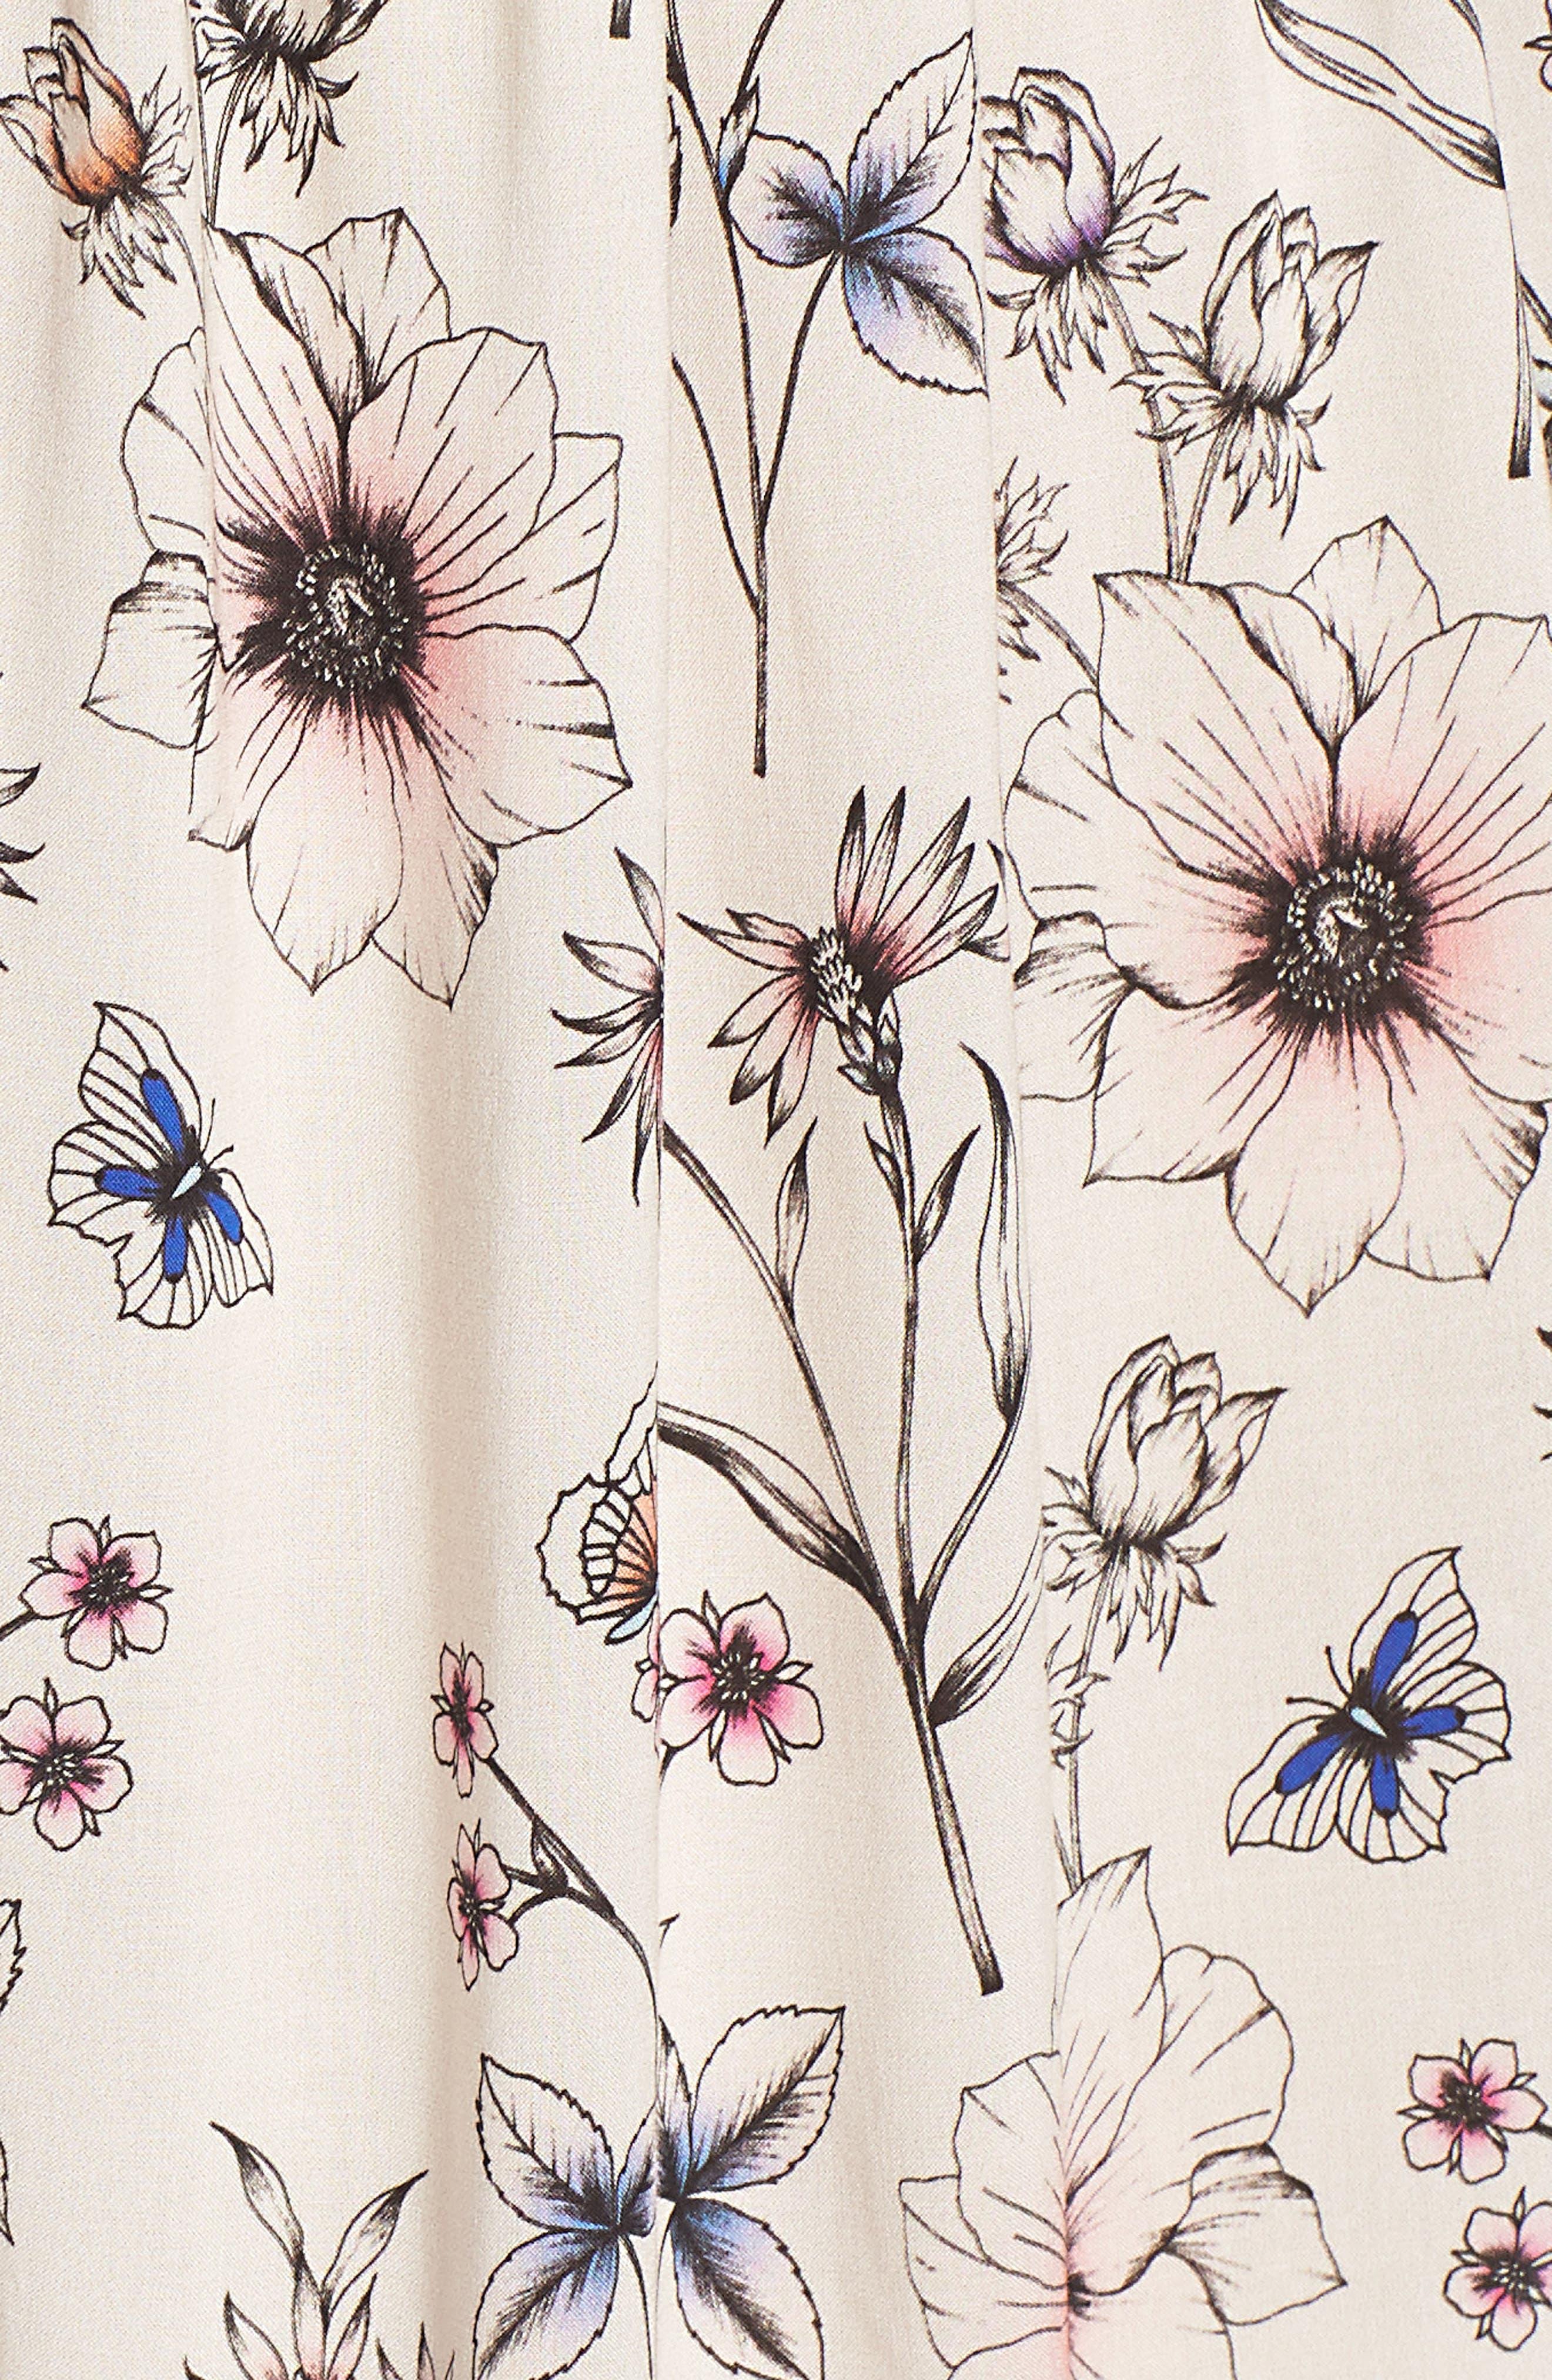 Floral Printed Minidress,                             Alternate thumbnail 6, color,                             900